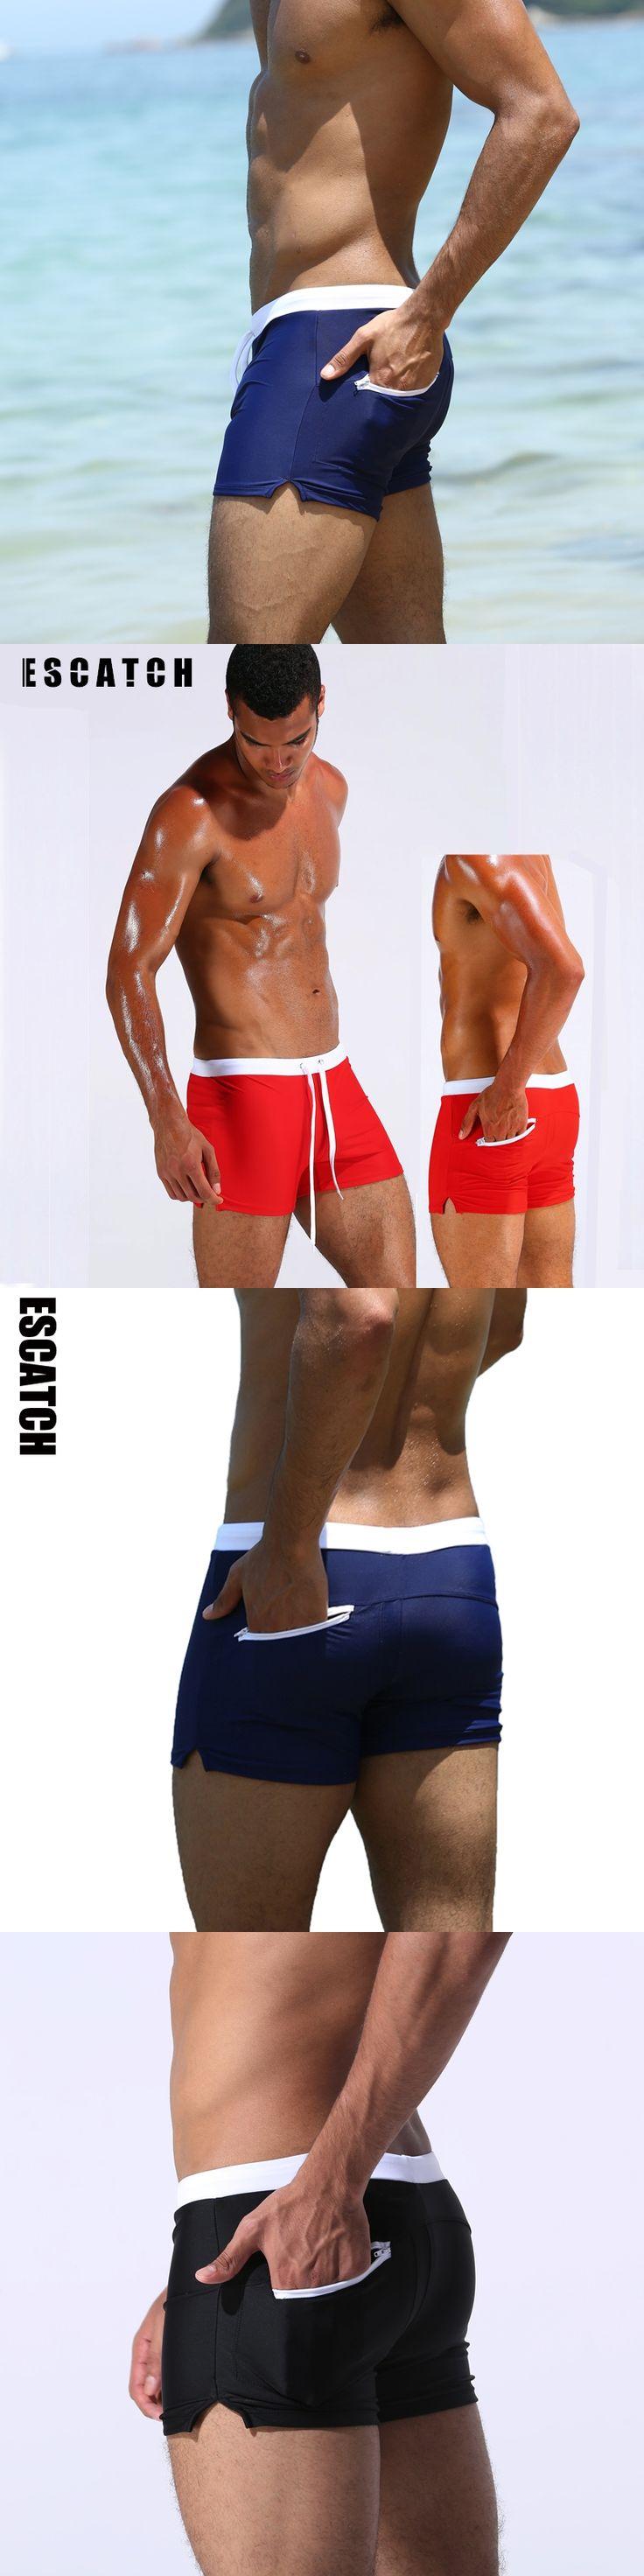 Swimwear men ESCATCH Men's Swimsuits Sexy swim trunks Surf Board Beach Wear Man Boxer Shorts hot mens swim brief